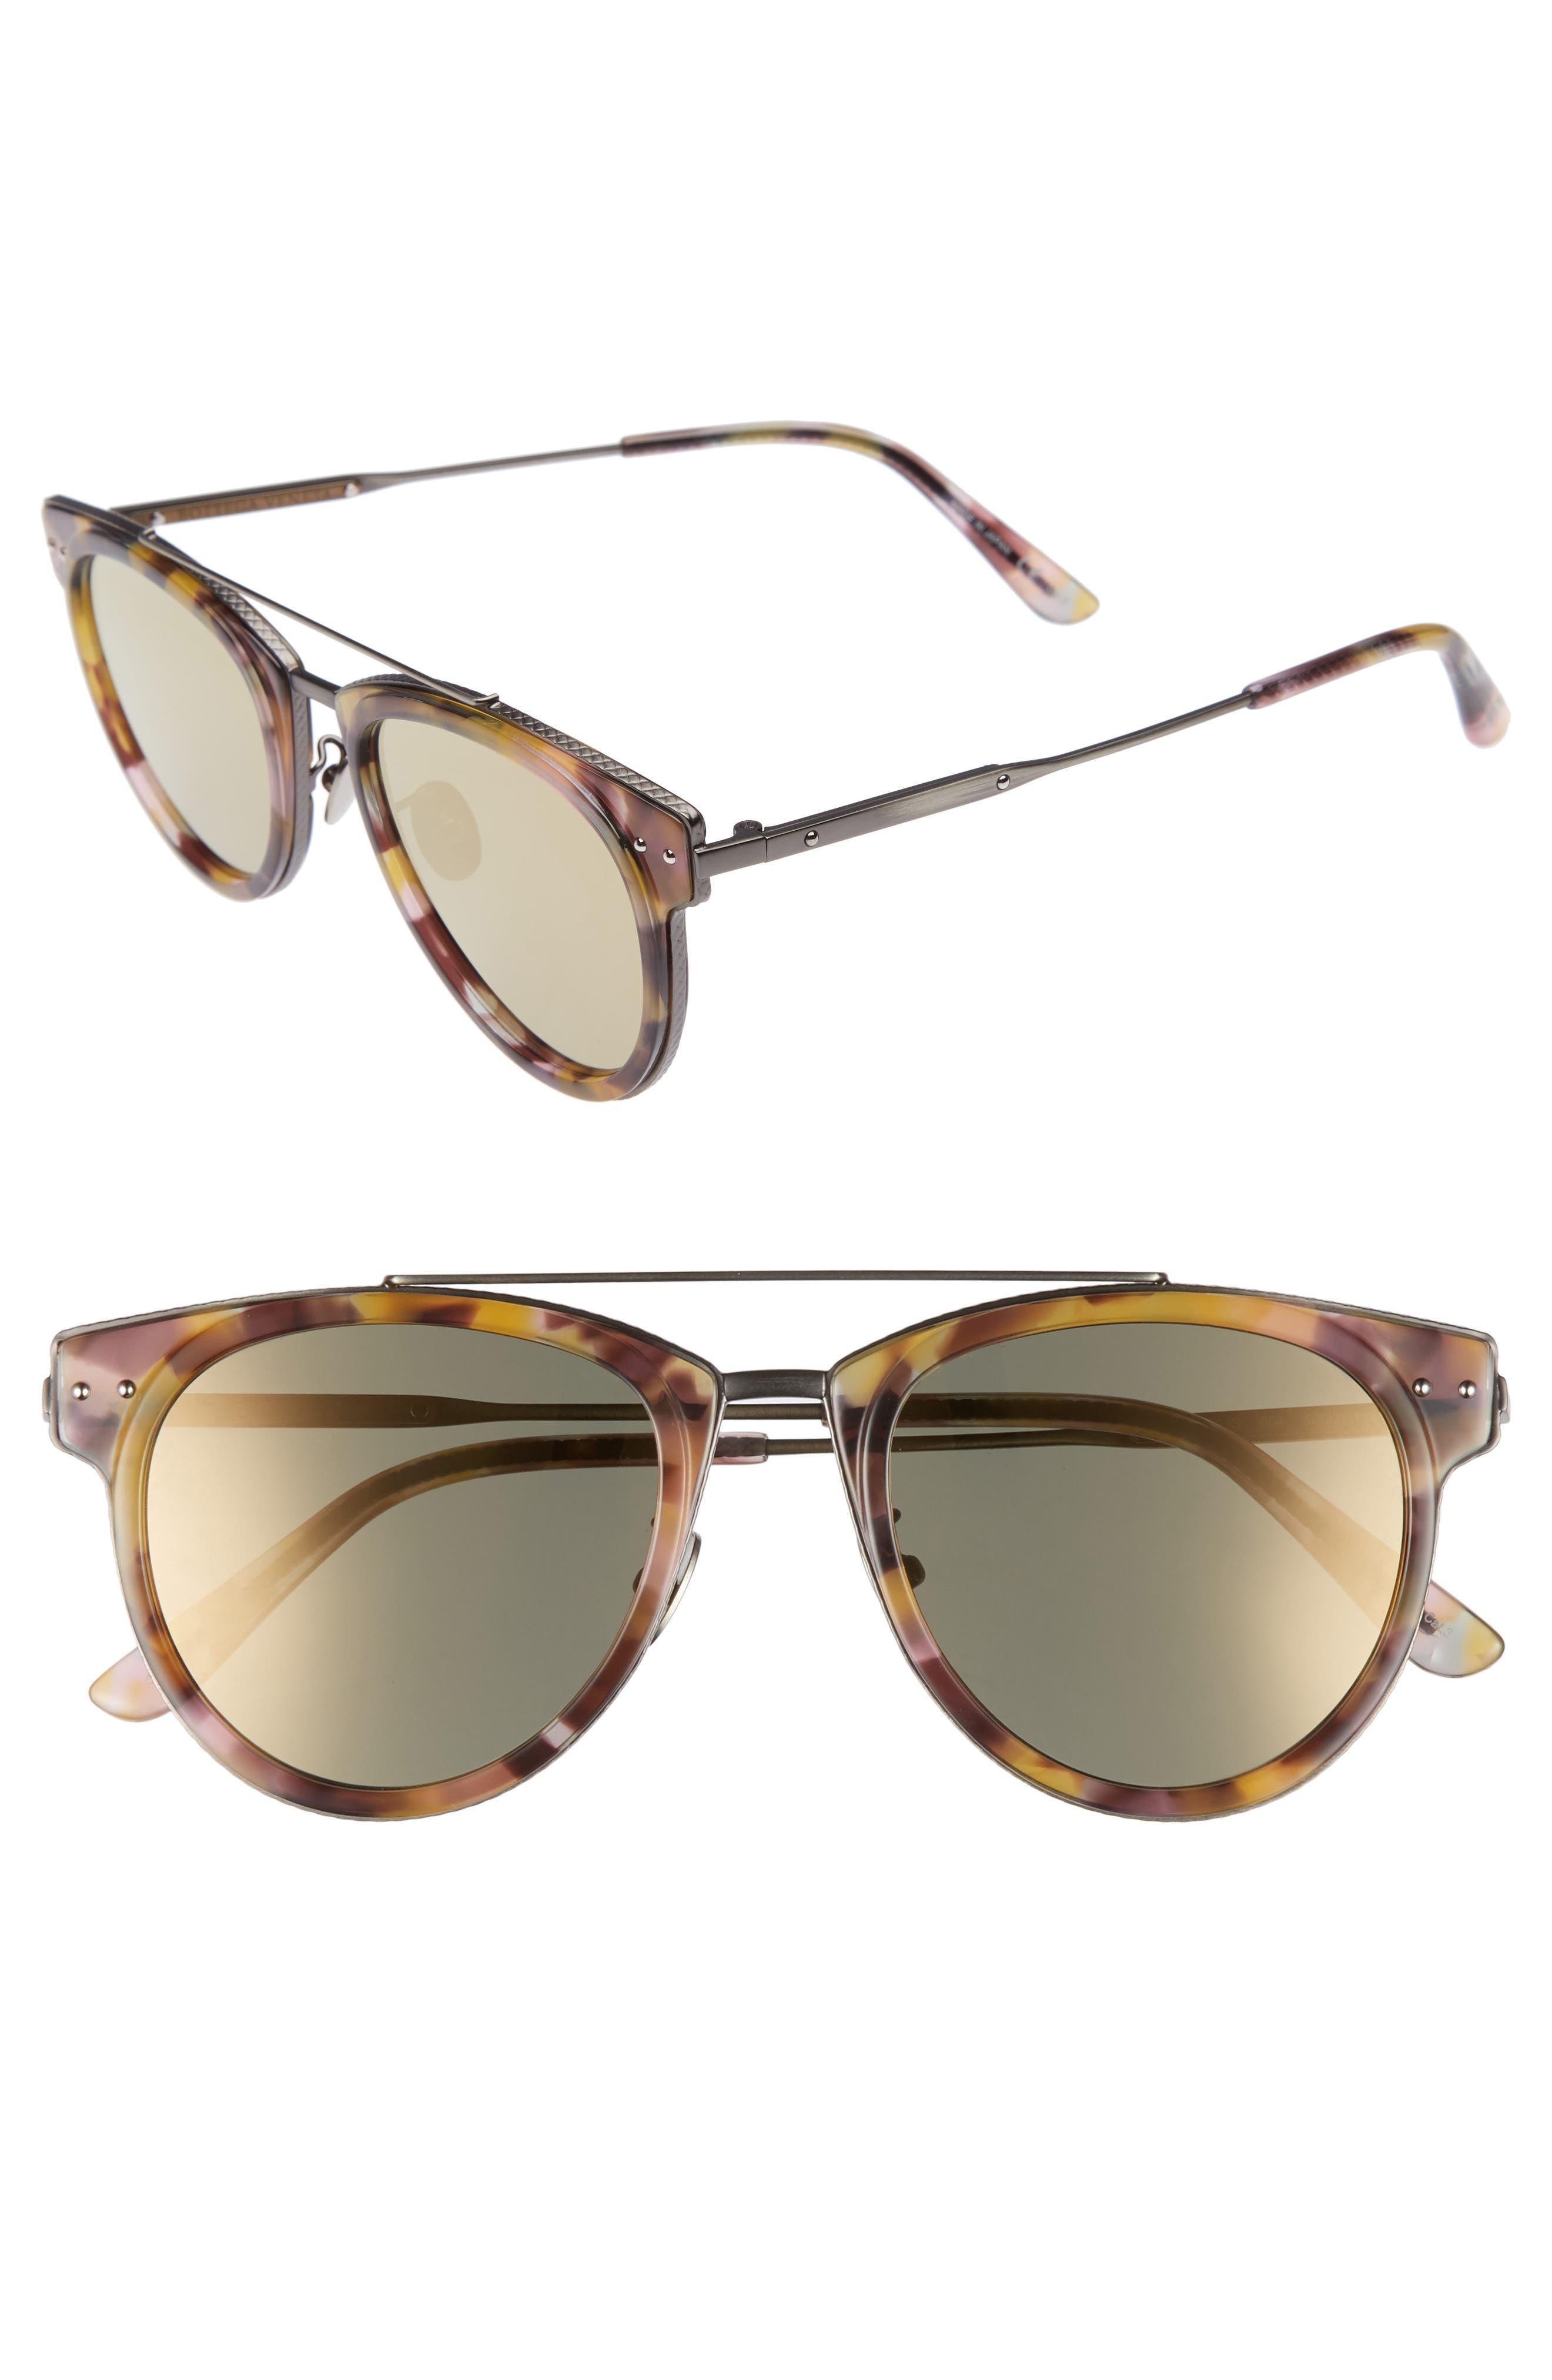 Alternate Image 1 Selected - Bottega Veneta 50mm Sunglasses